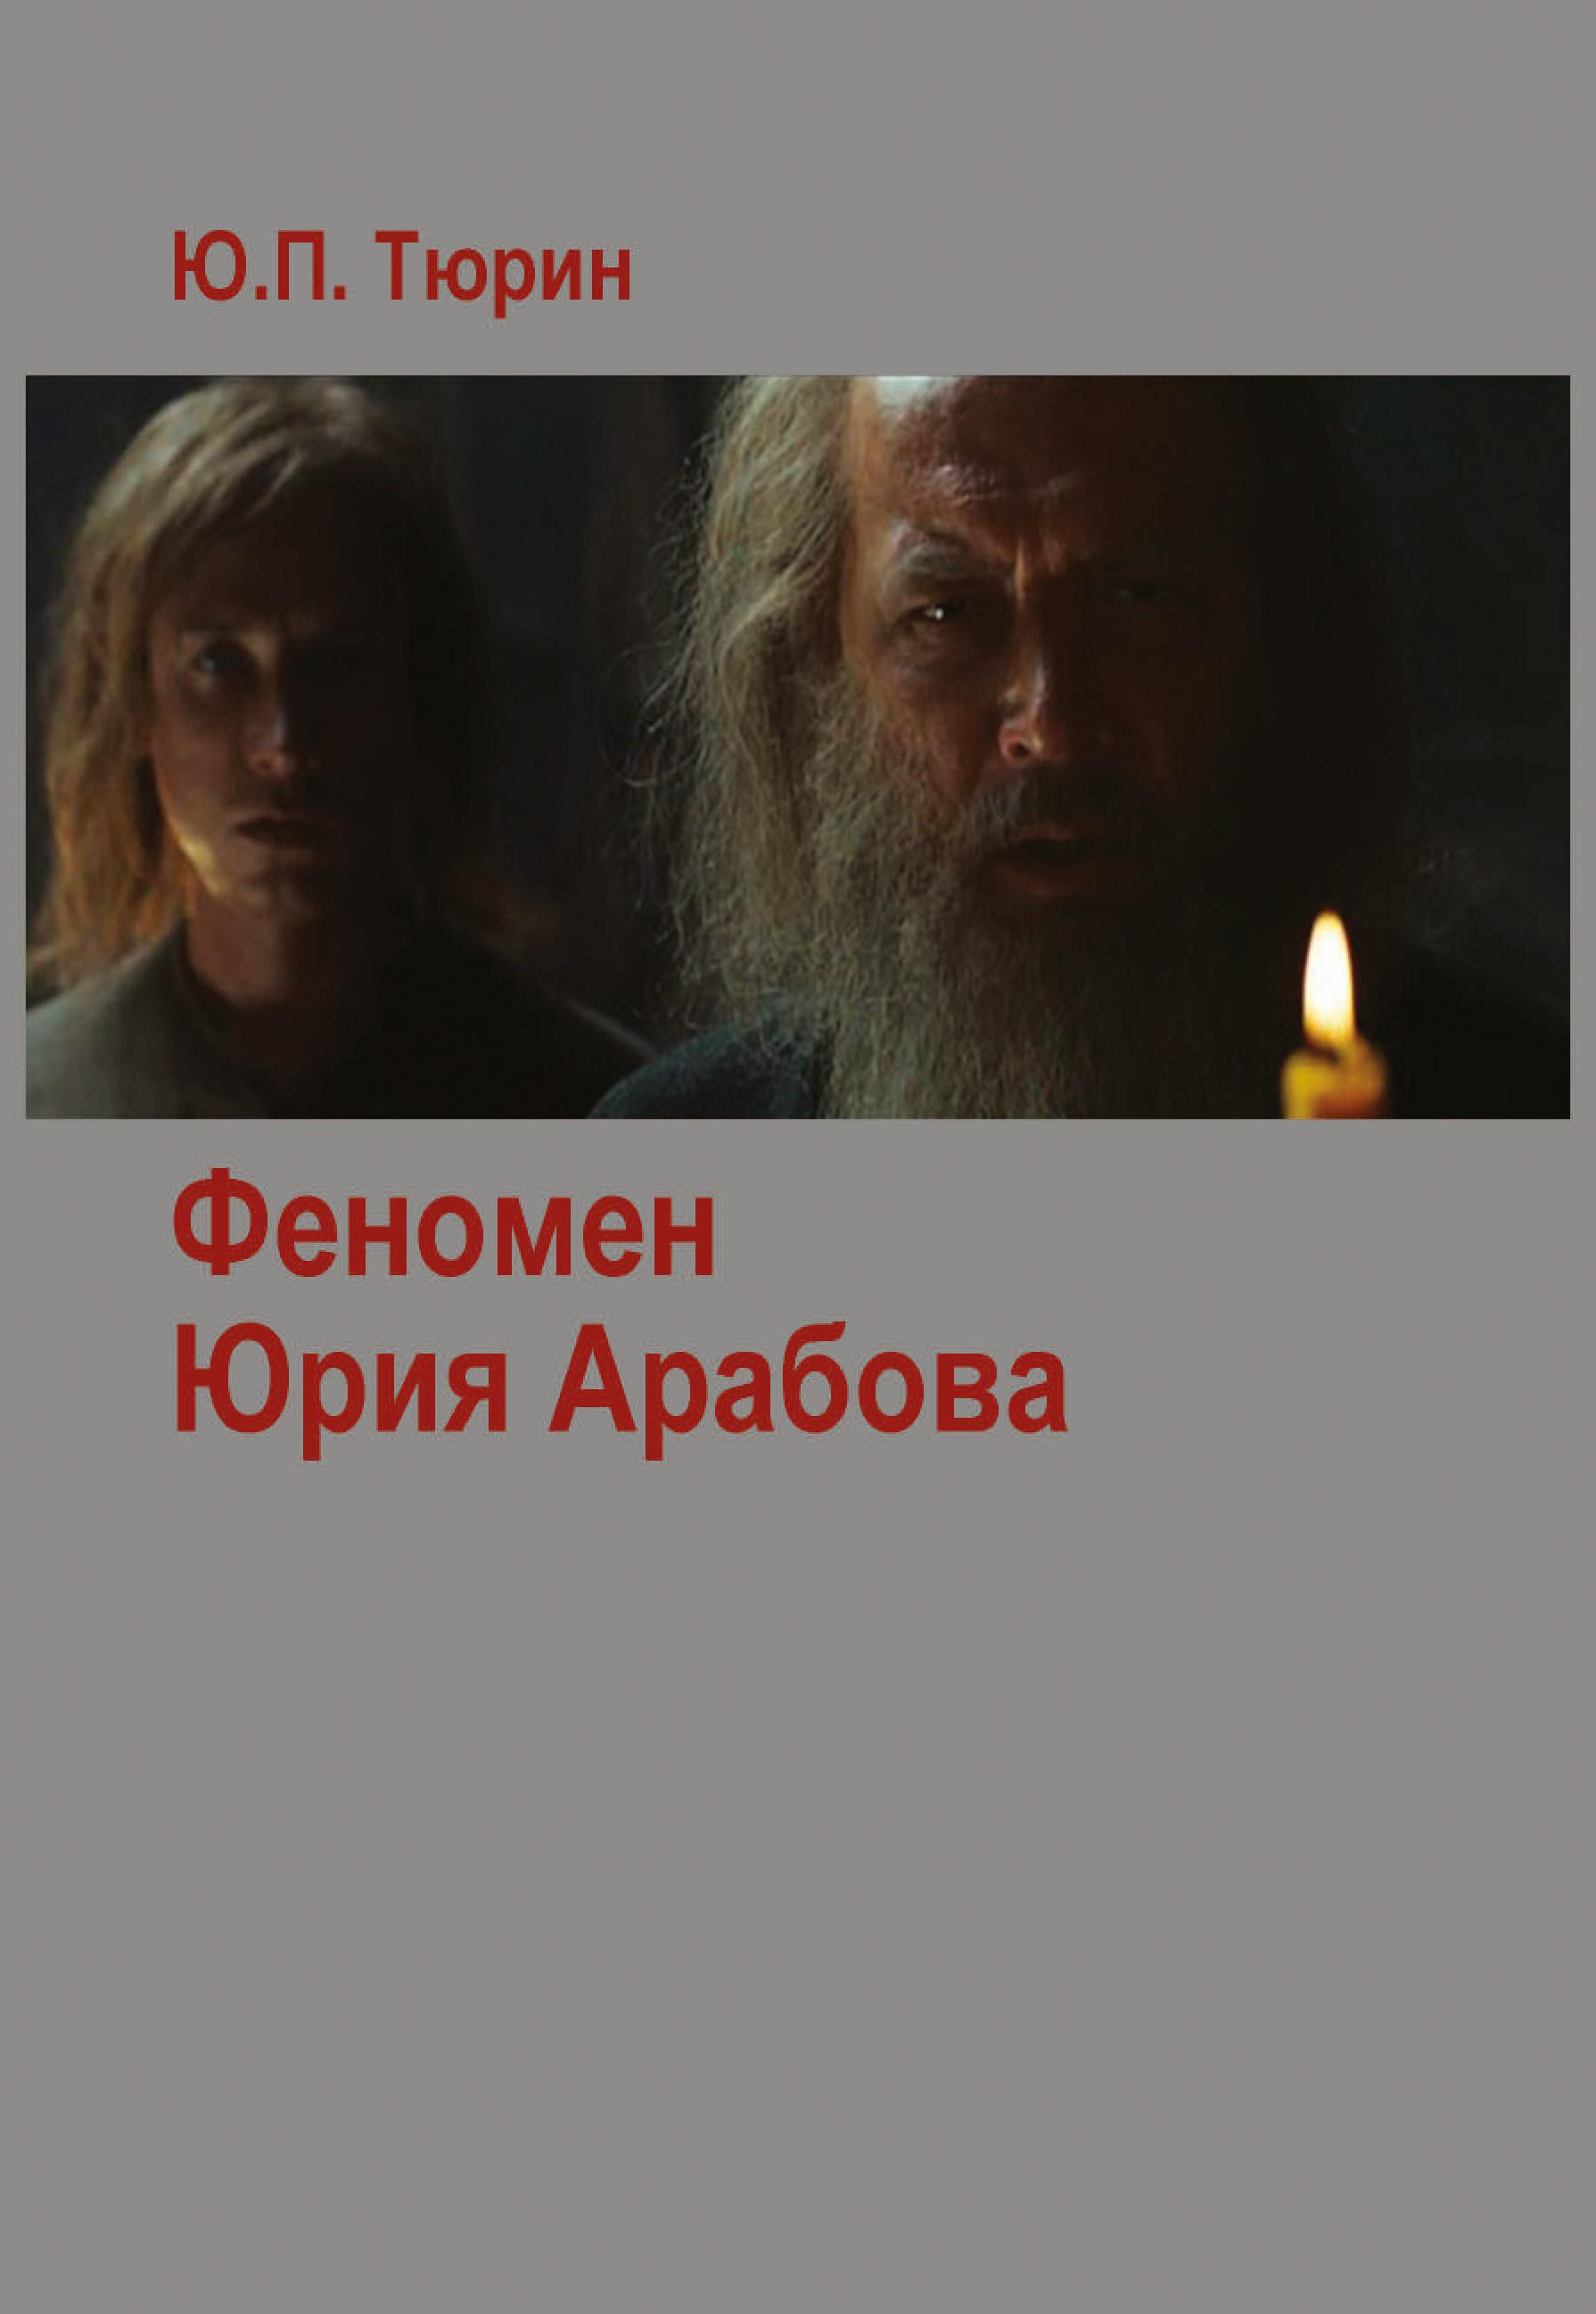 Феномен Юрия Арабова (сборник)